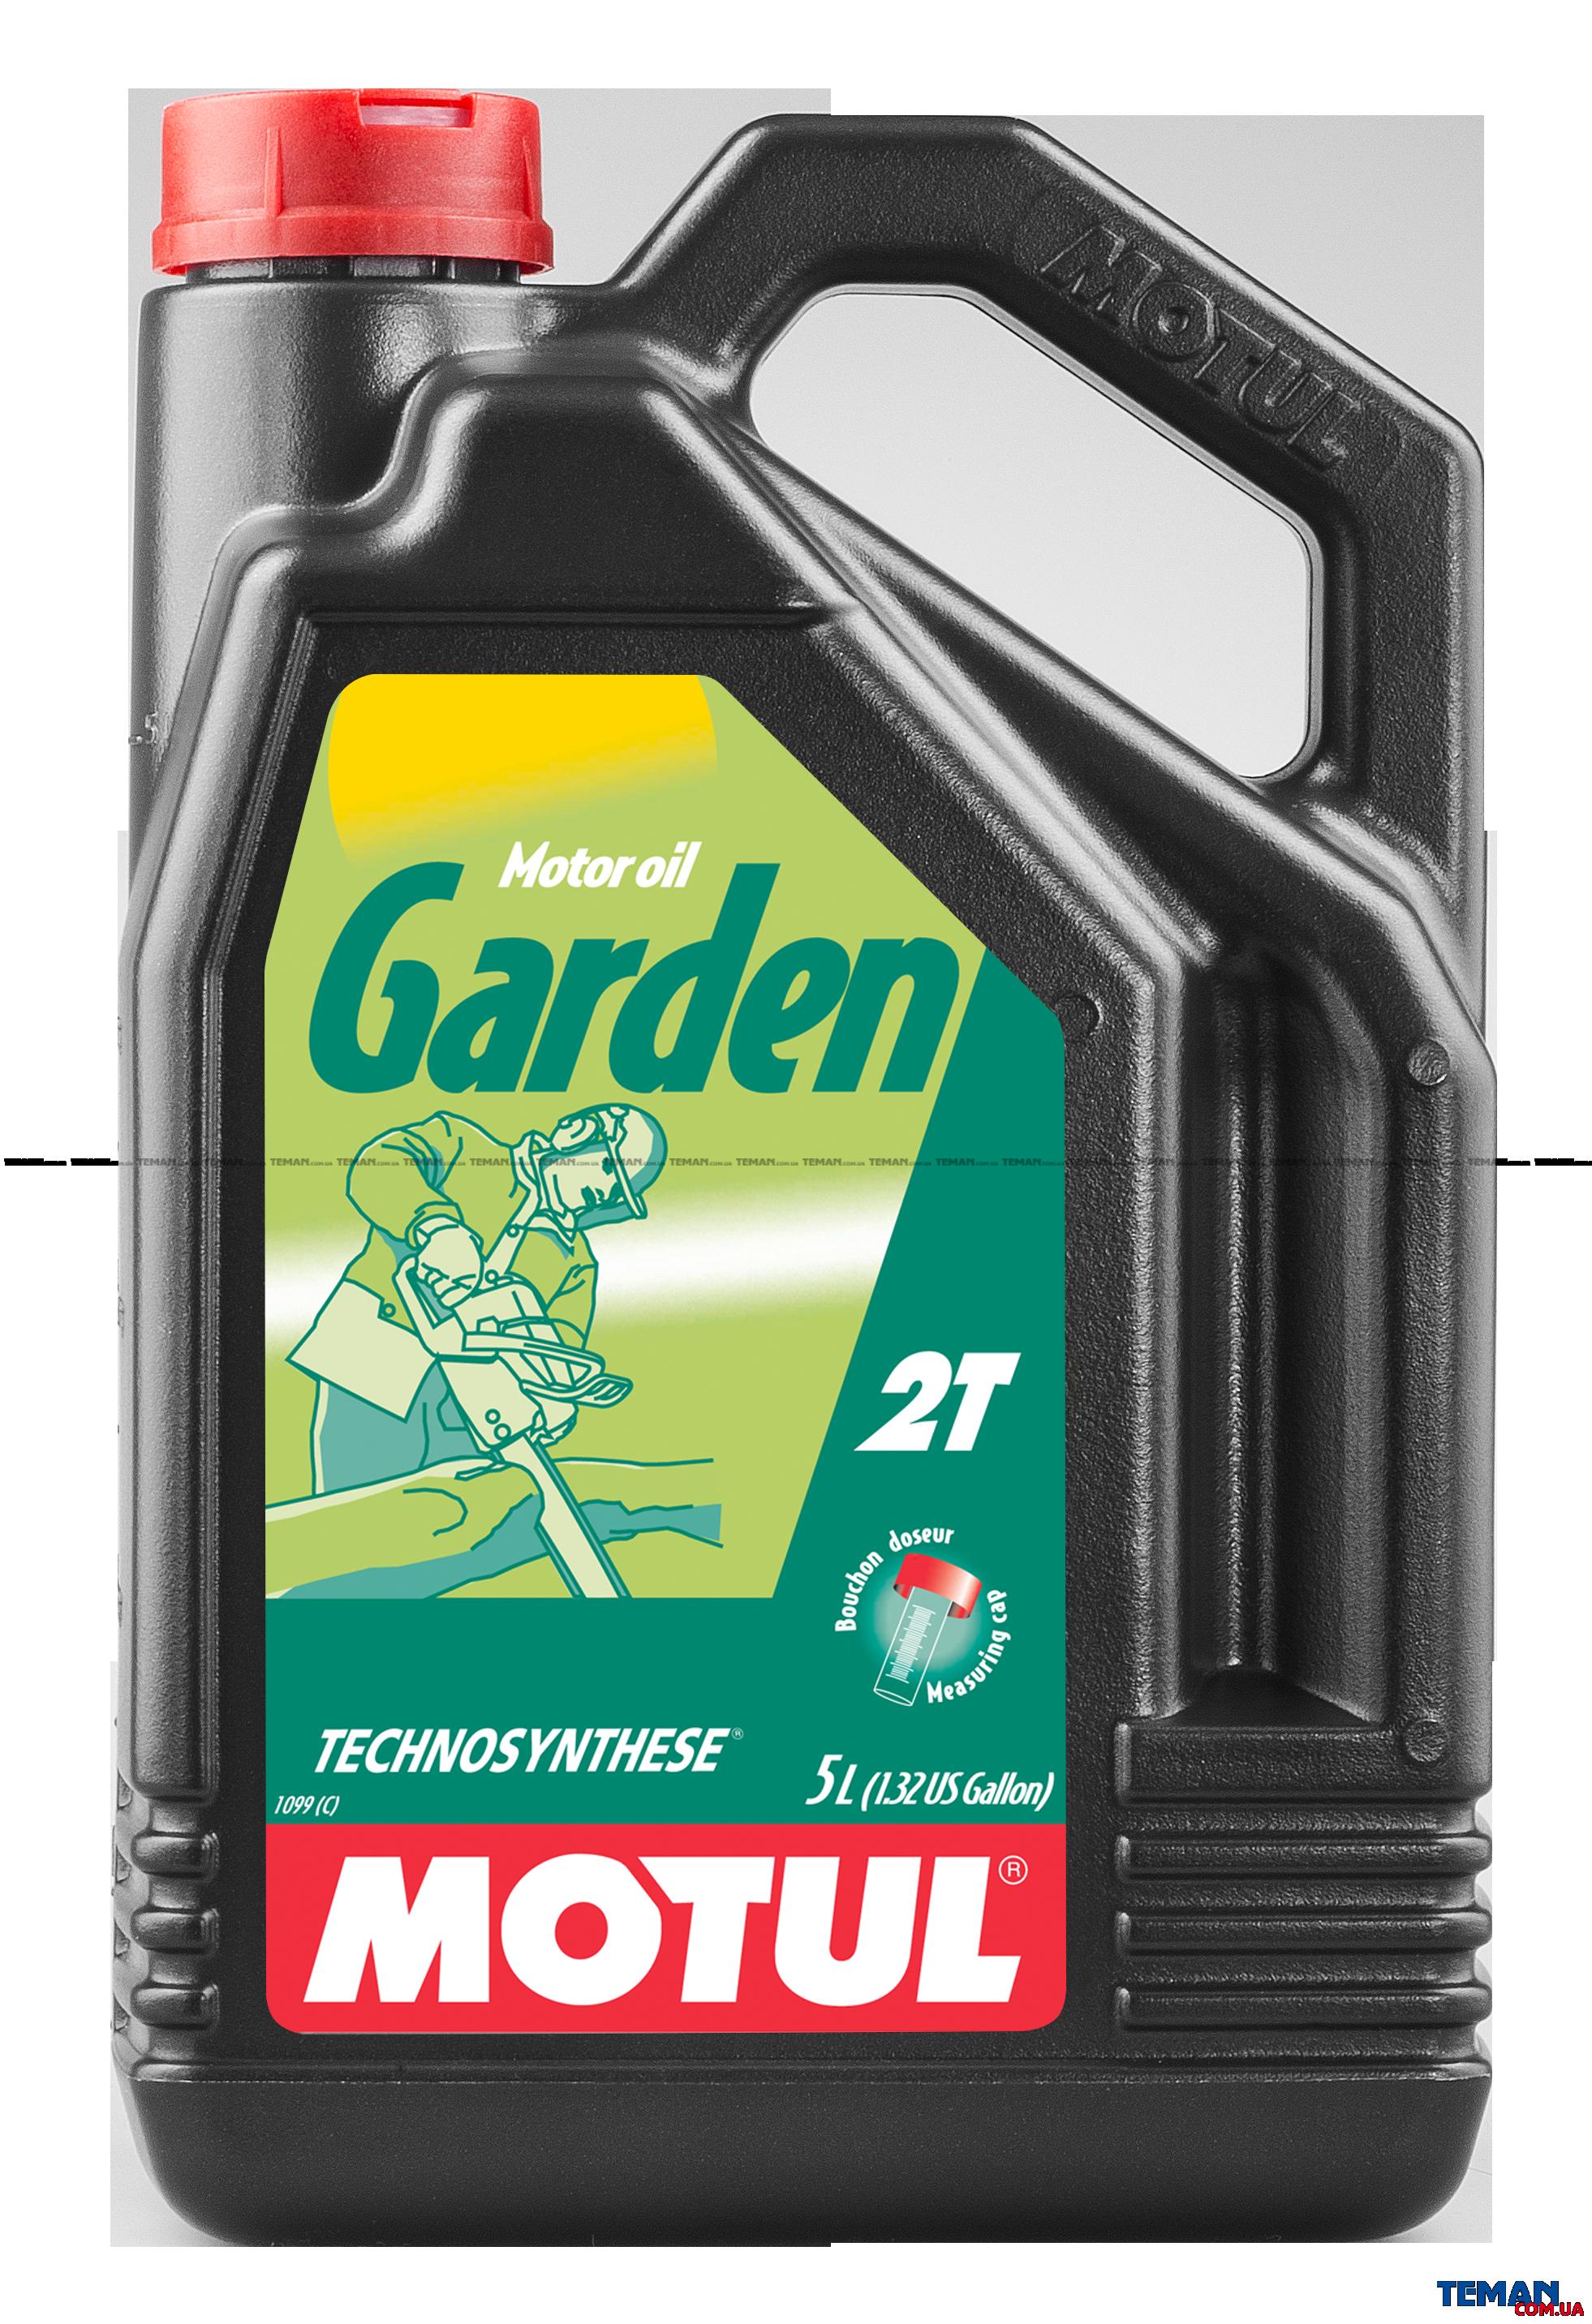 Масло для 2-х тактных двигателей Garden 2T, 5 л